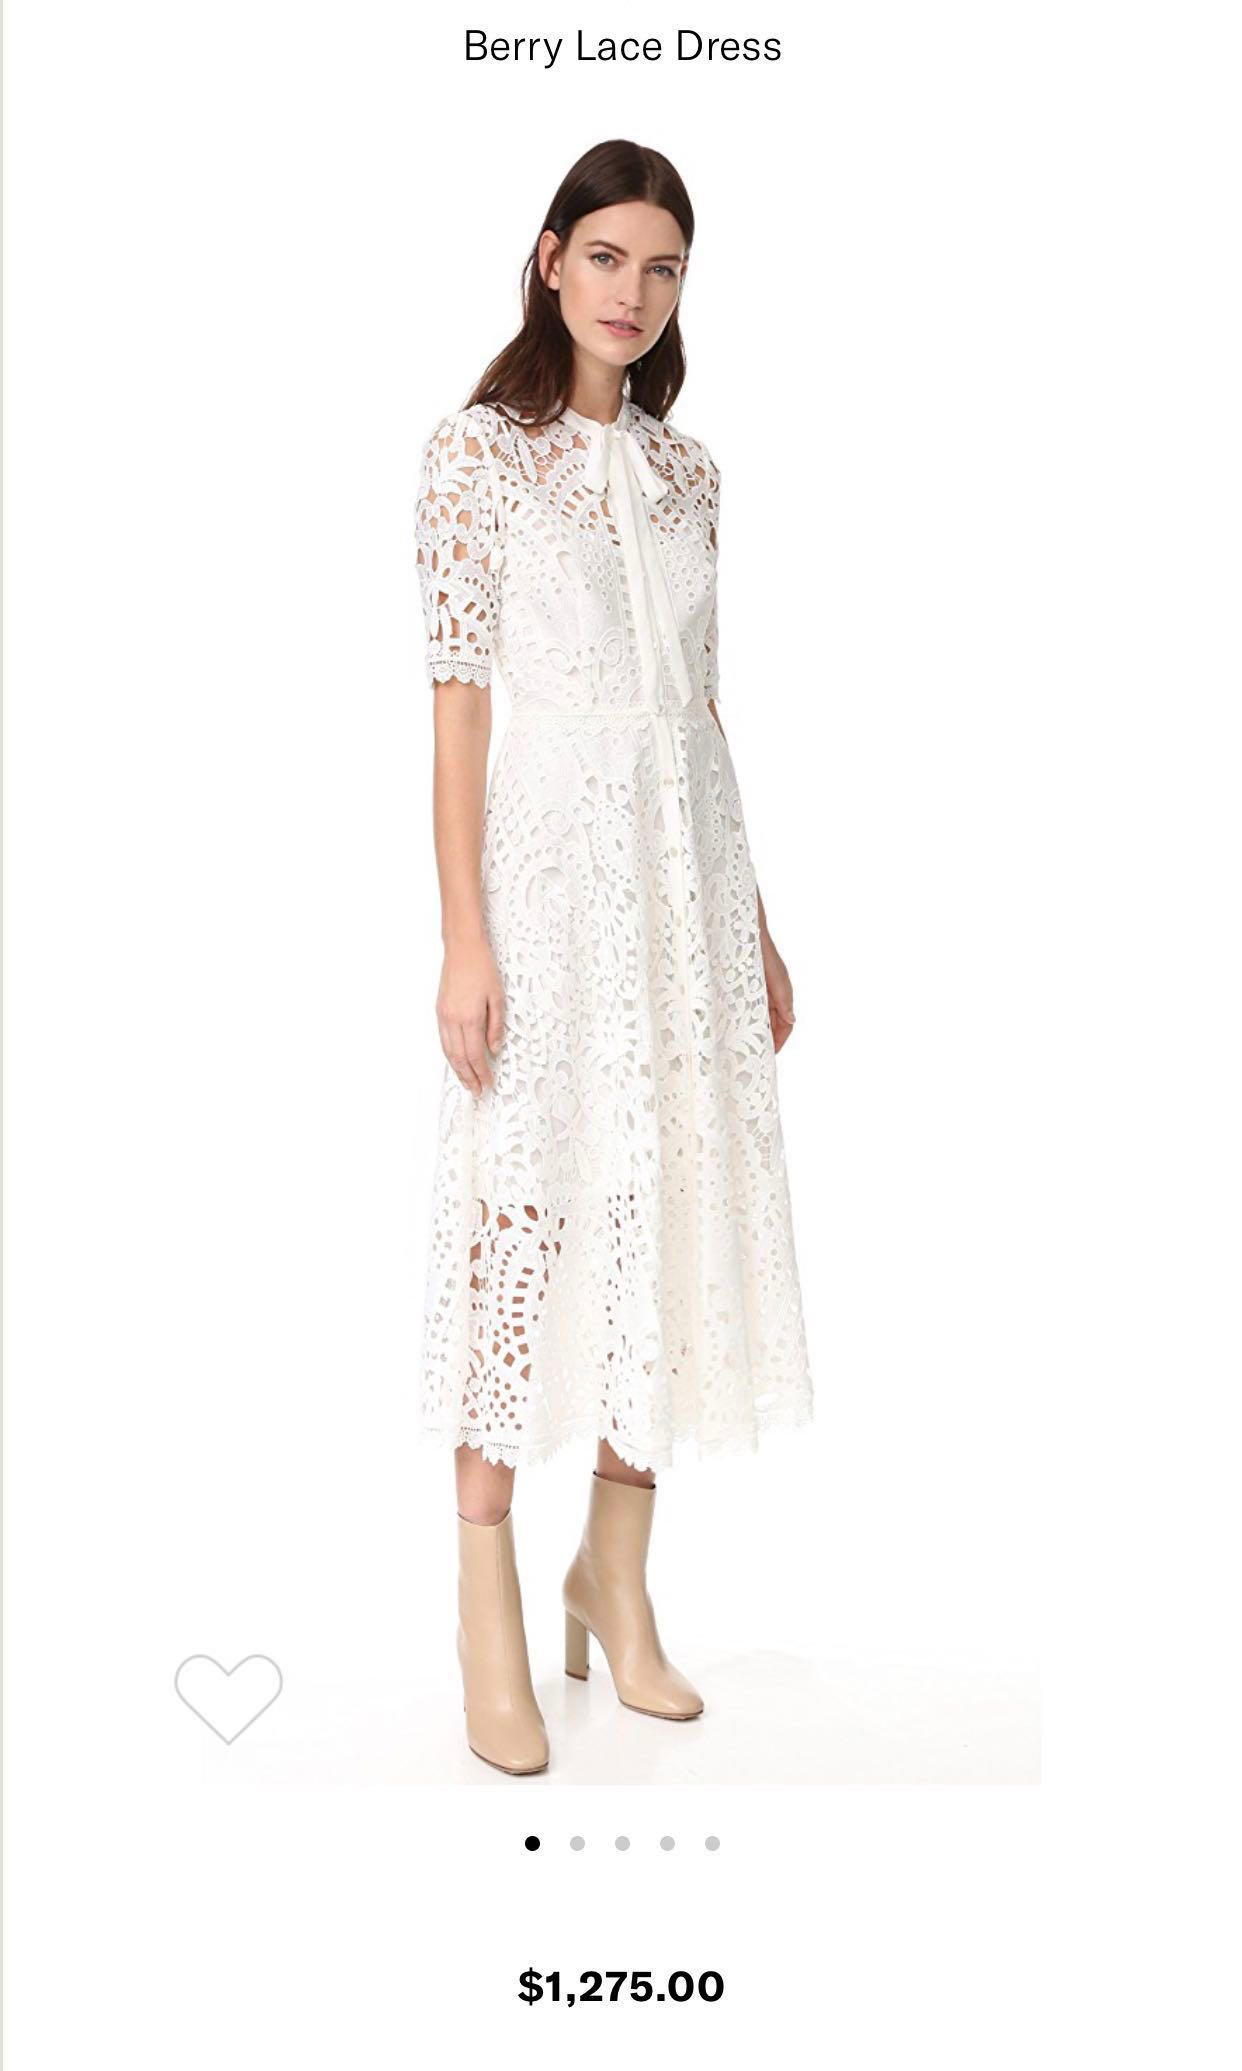 d8757ec86b90 Authentic Stunning Temperley London Berry Lace Dress